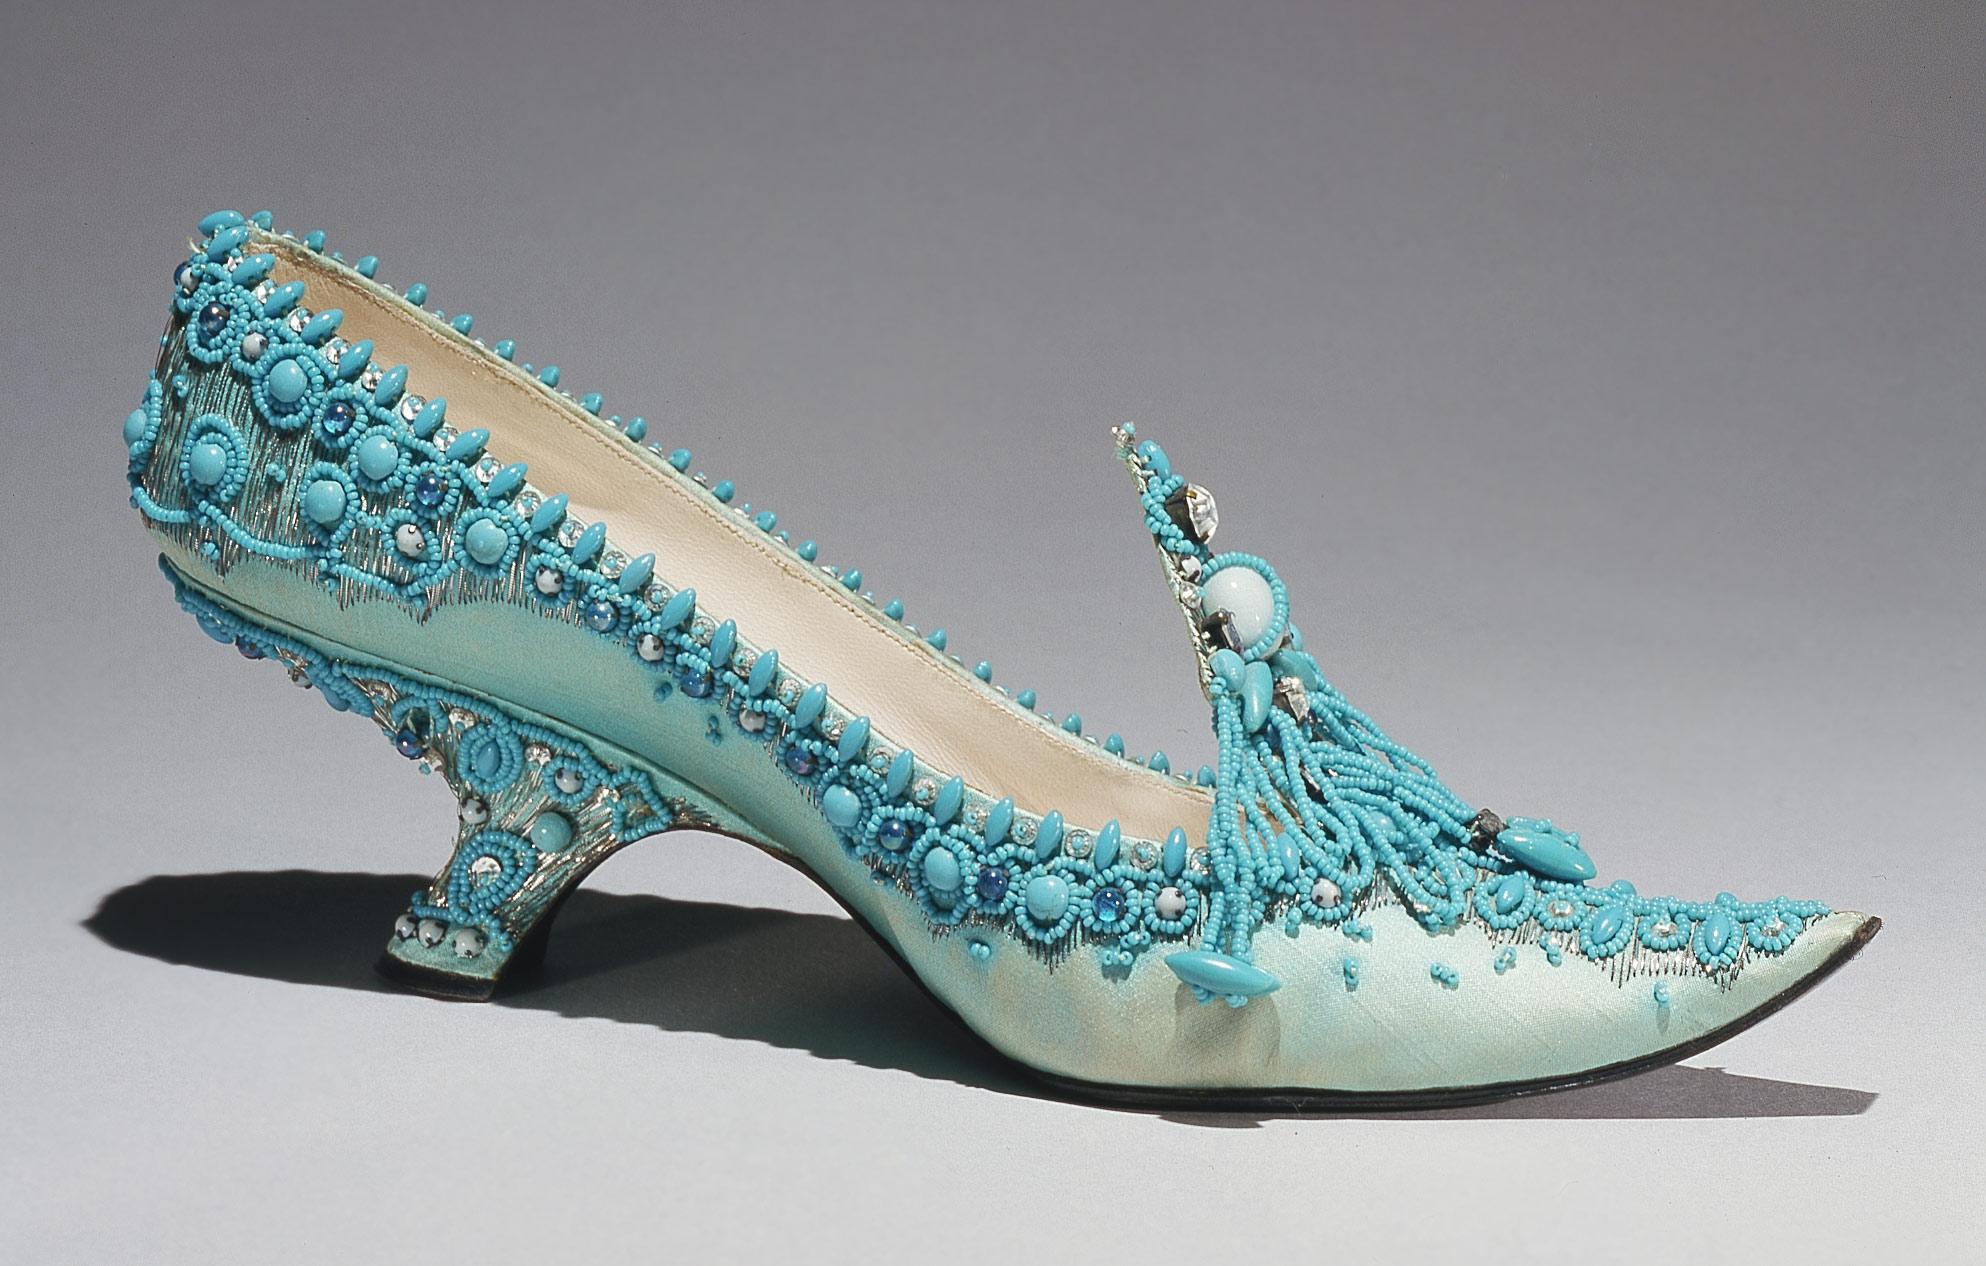 ferragamo wedding shoes photo - 1